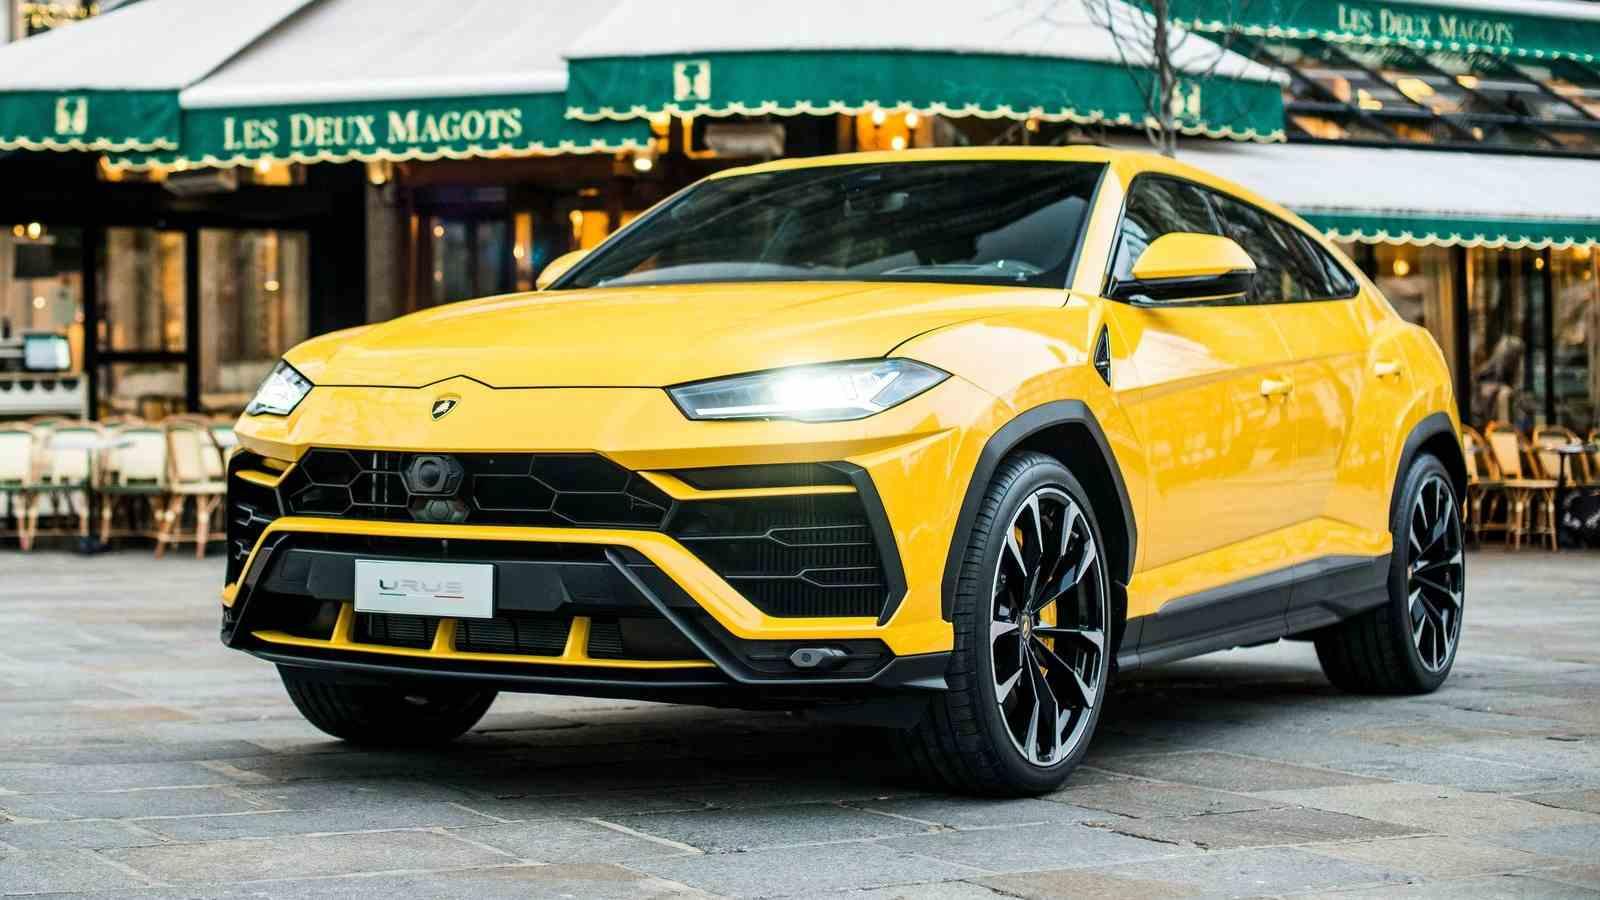 In 2020, the Urus helped Lamborghini better its annual sales record. Image: Lamborghini